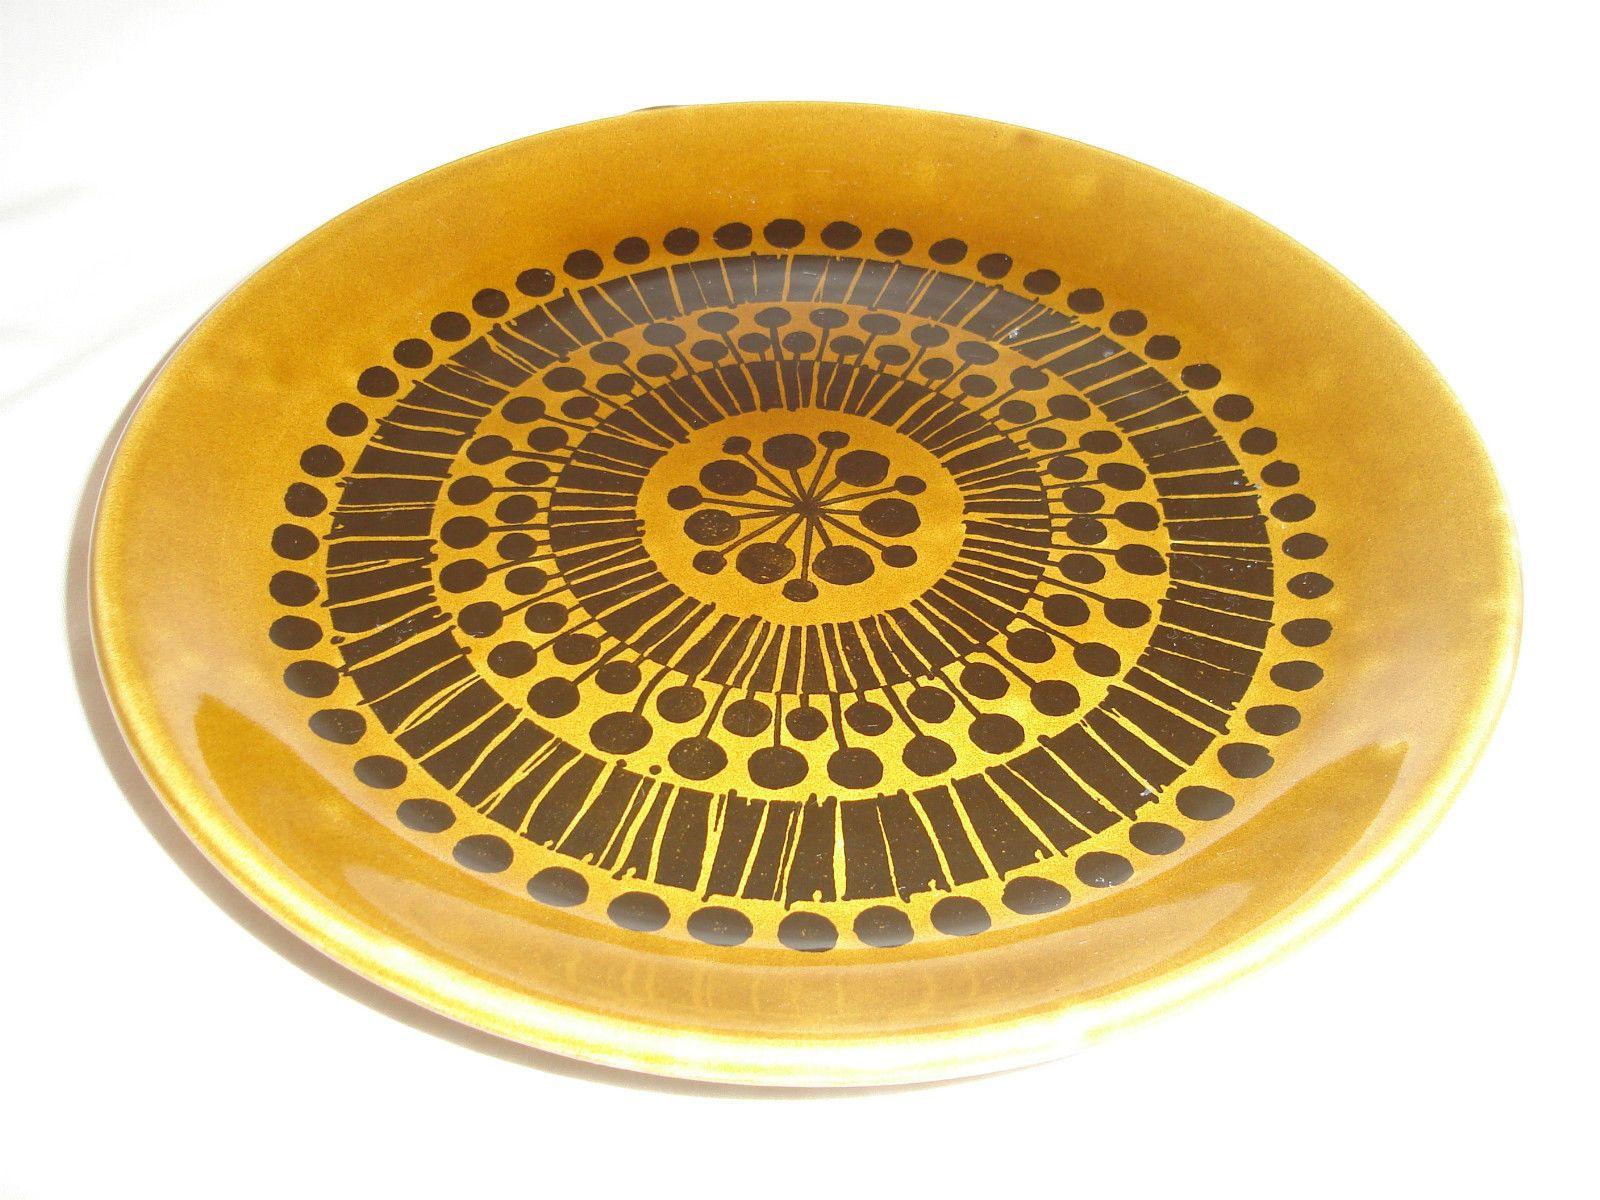 Vintage 1970s Biltons Staffordshire Dinner Plate Retro Design VGC ...